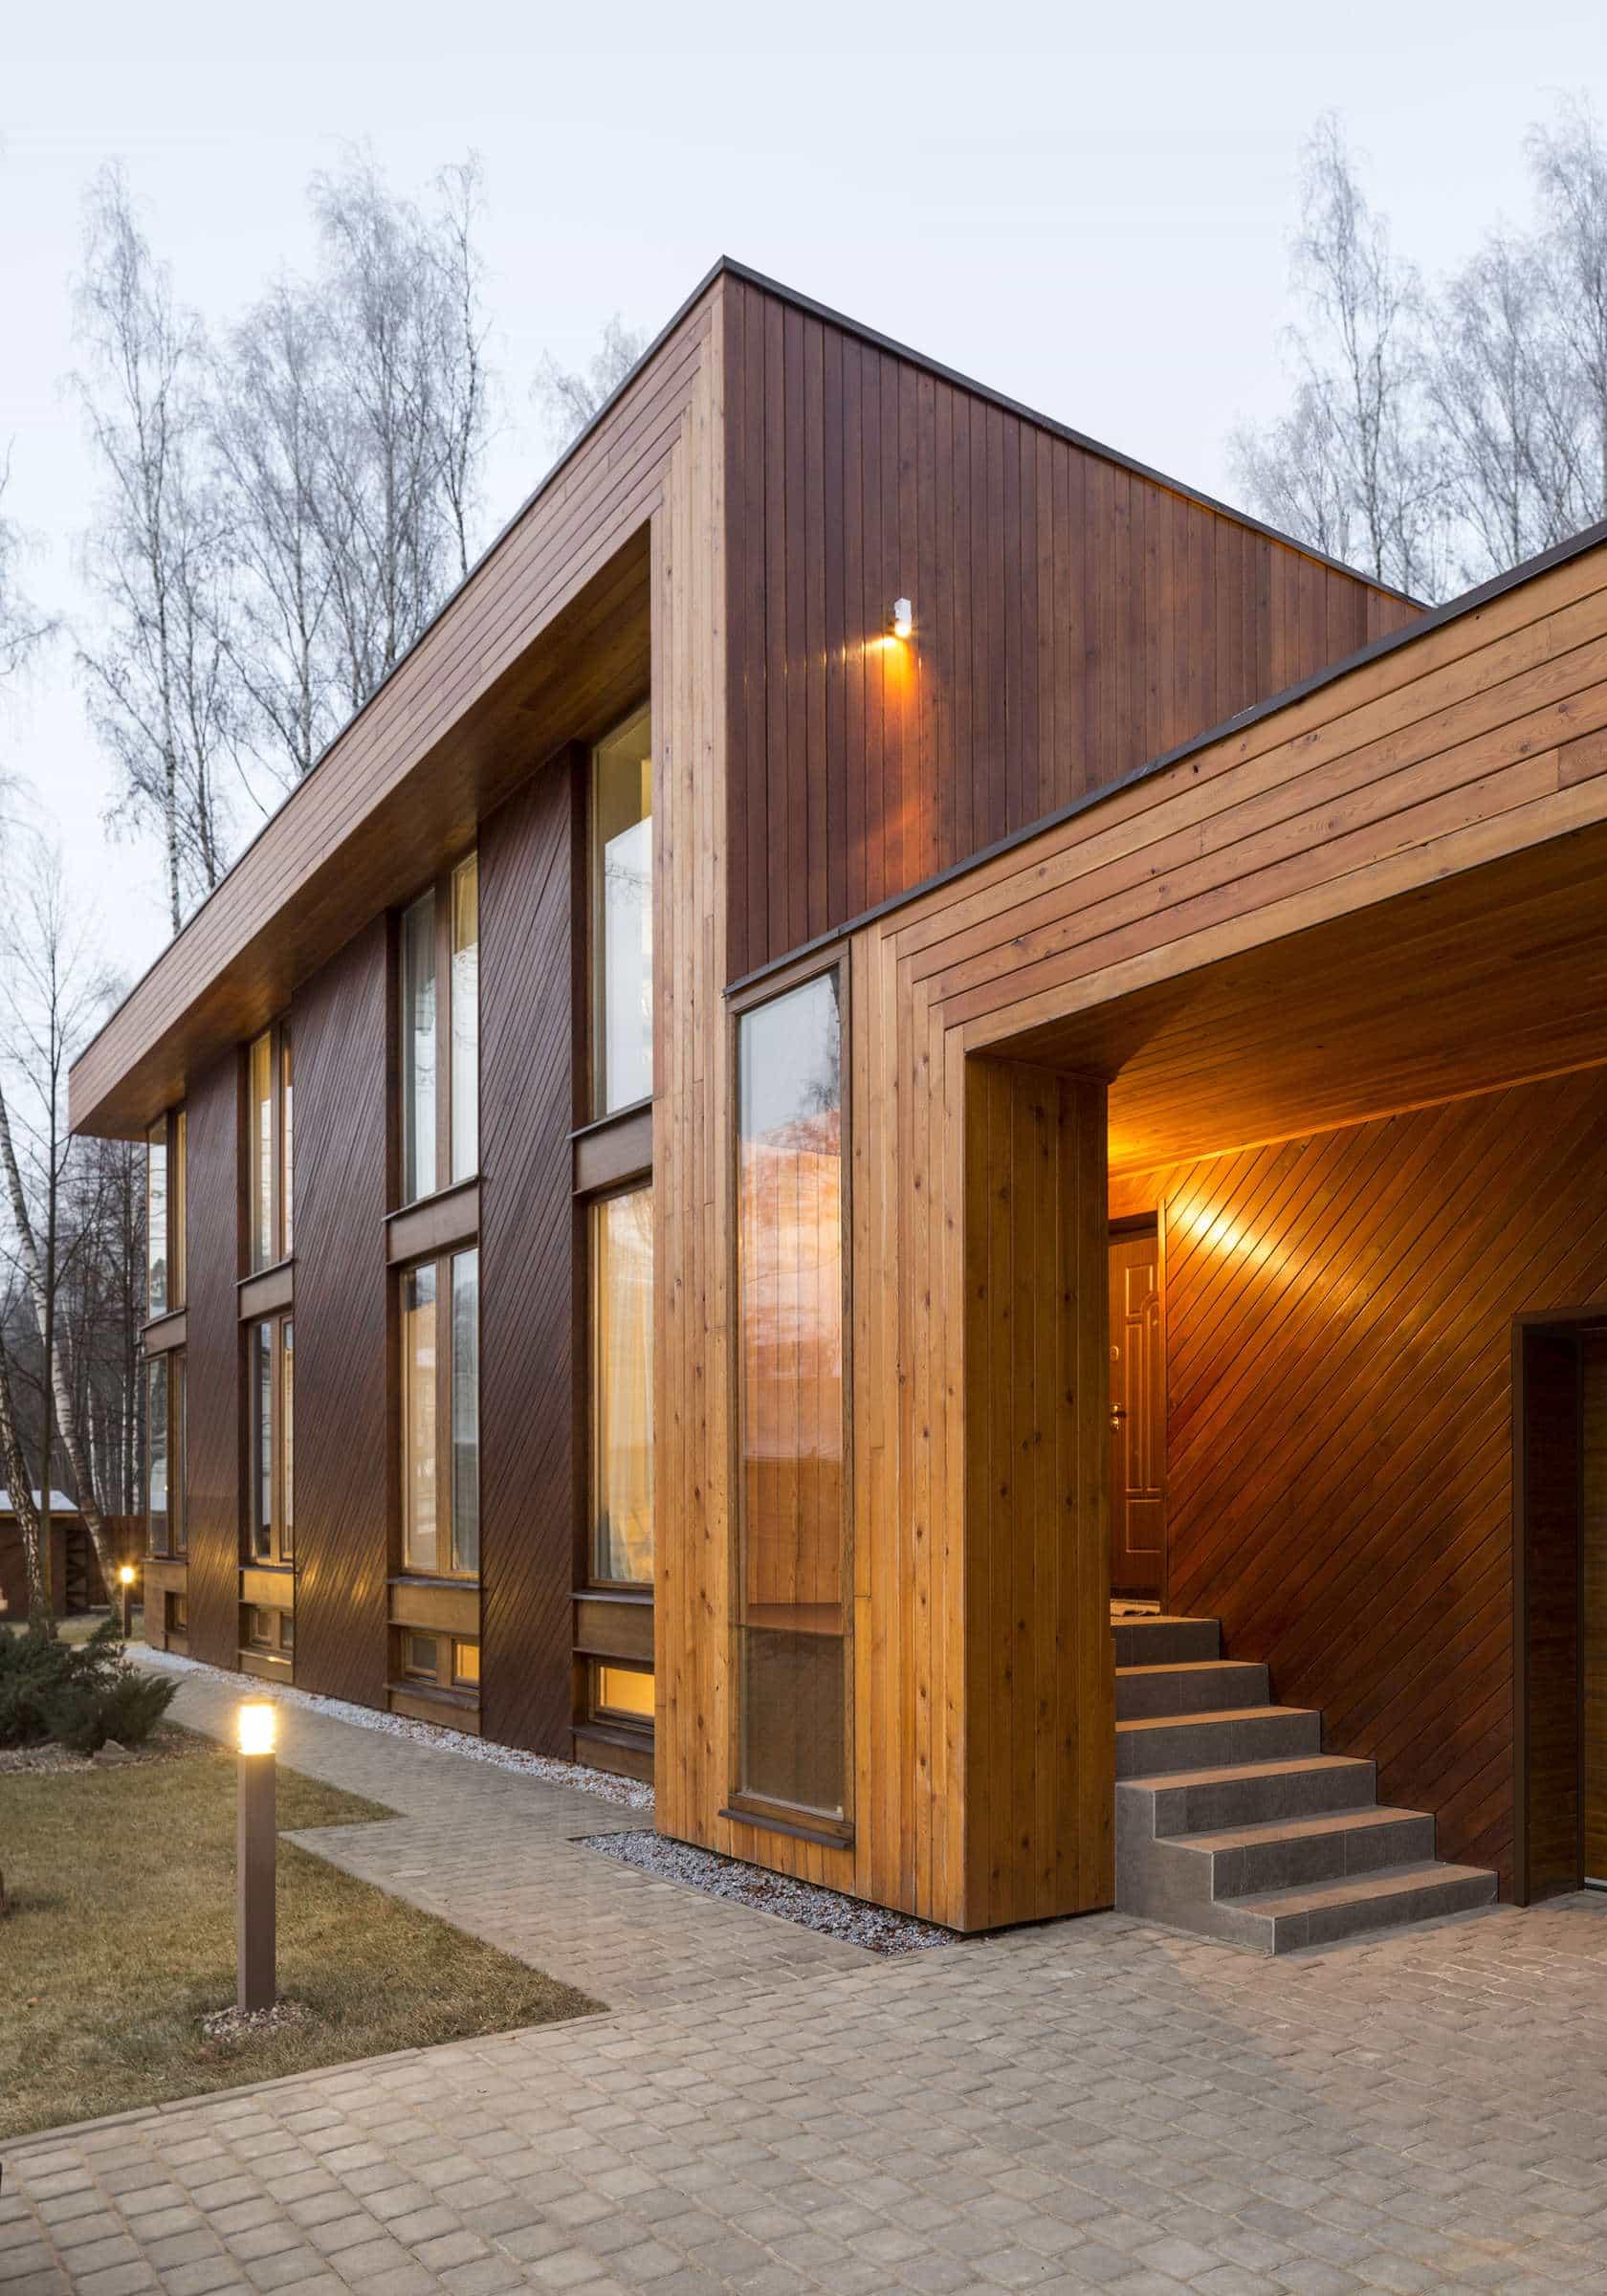 Fachada moderna minimalista con acabados en madera.